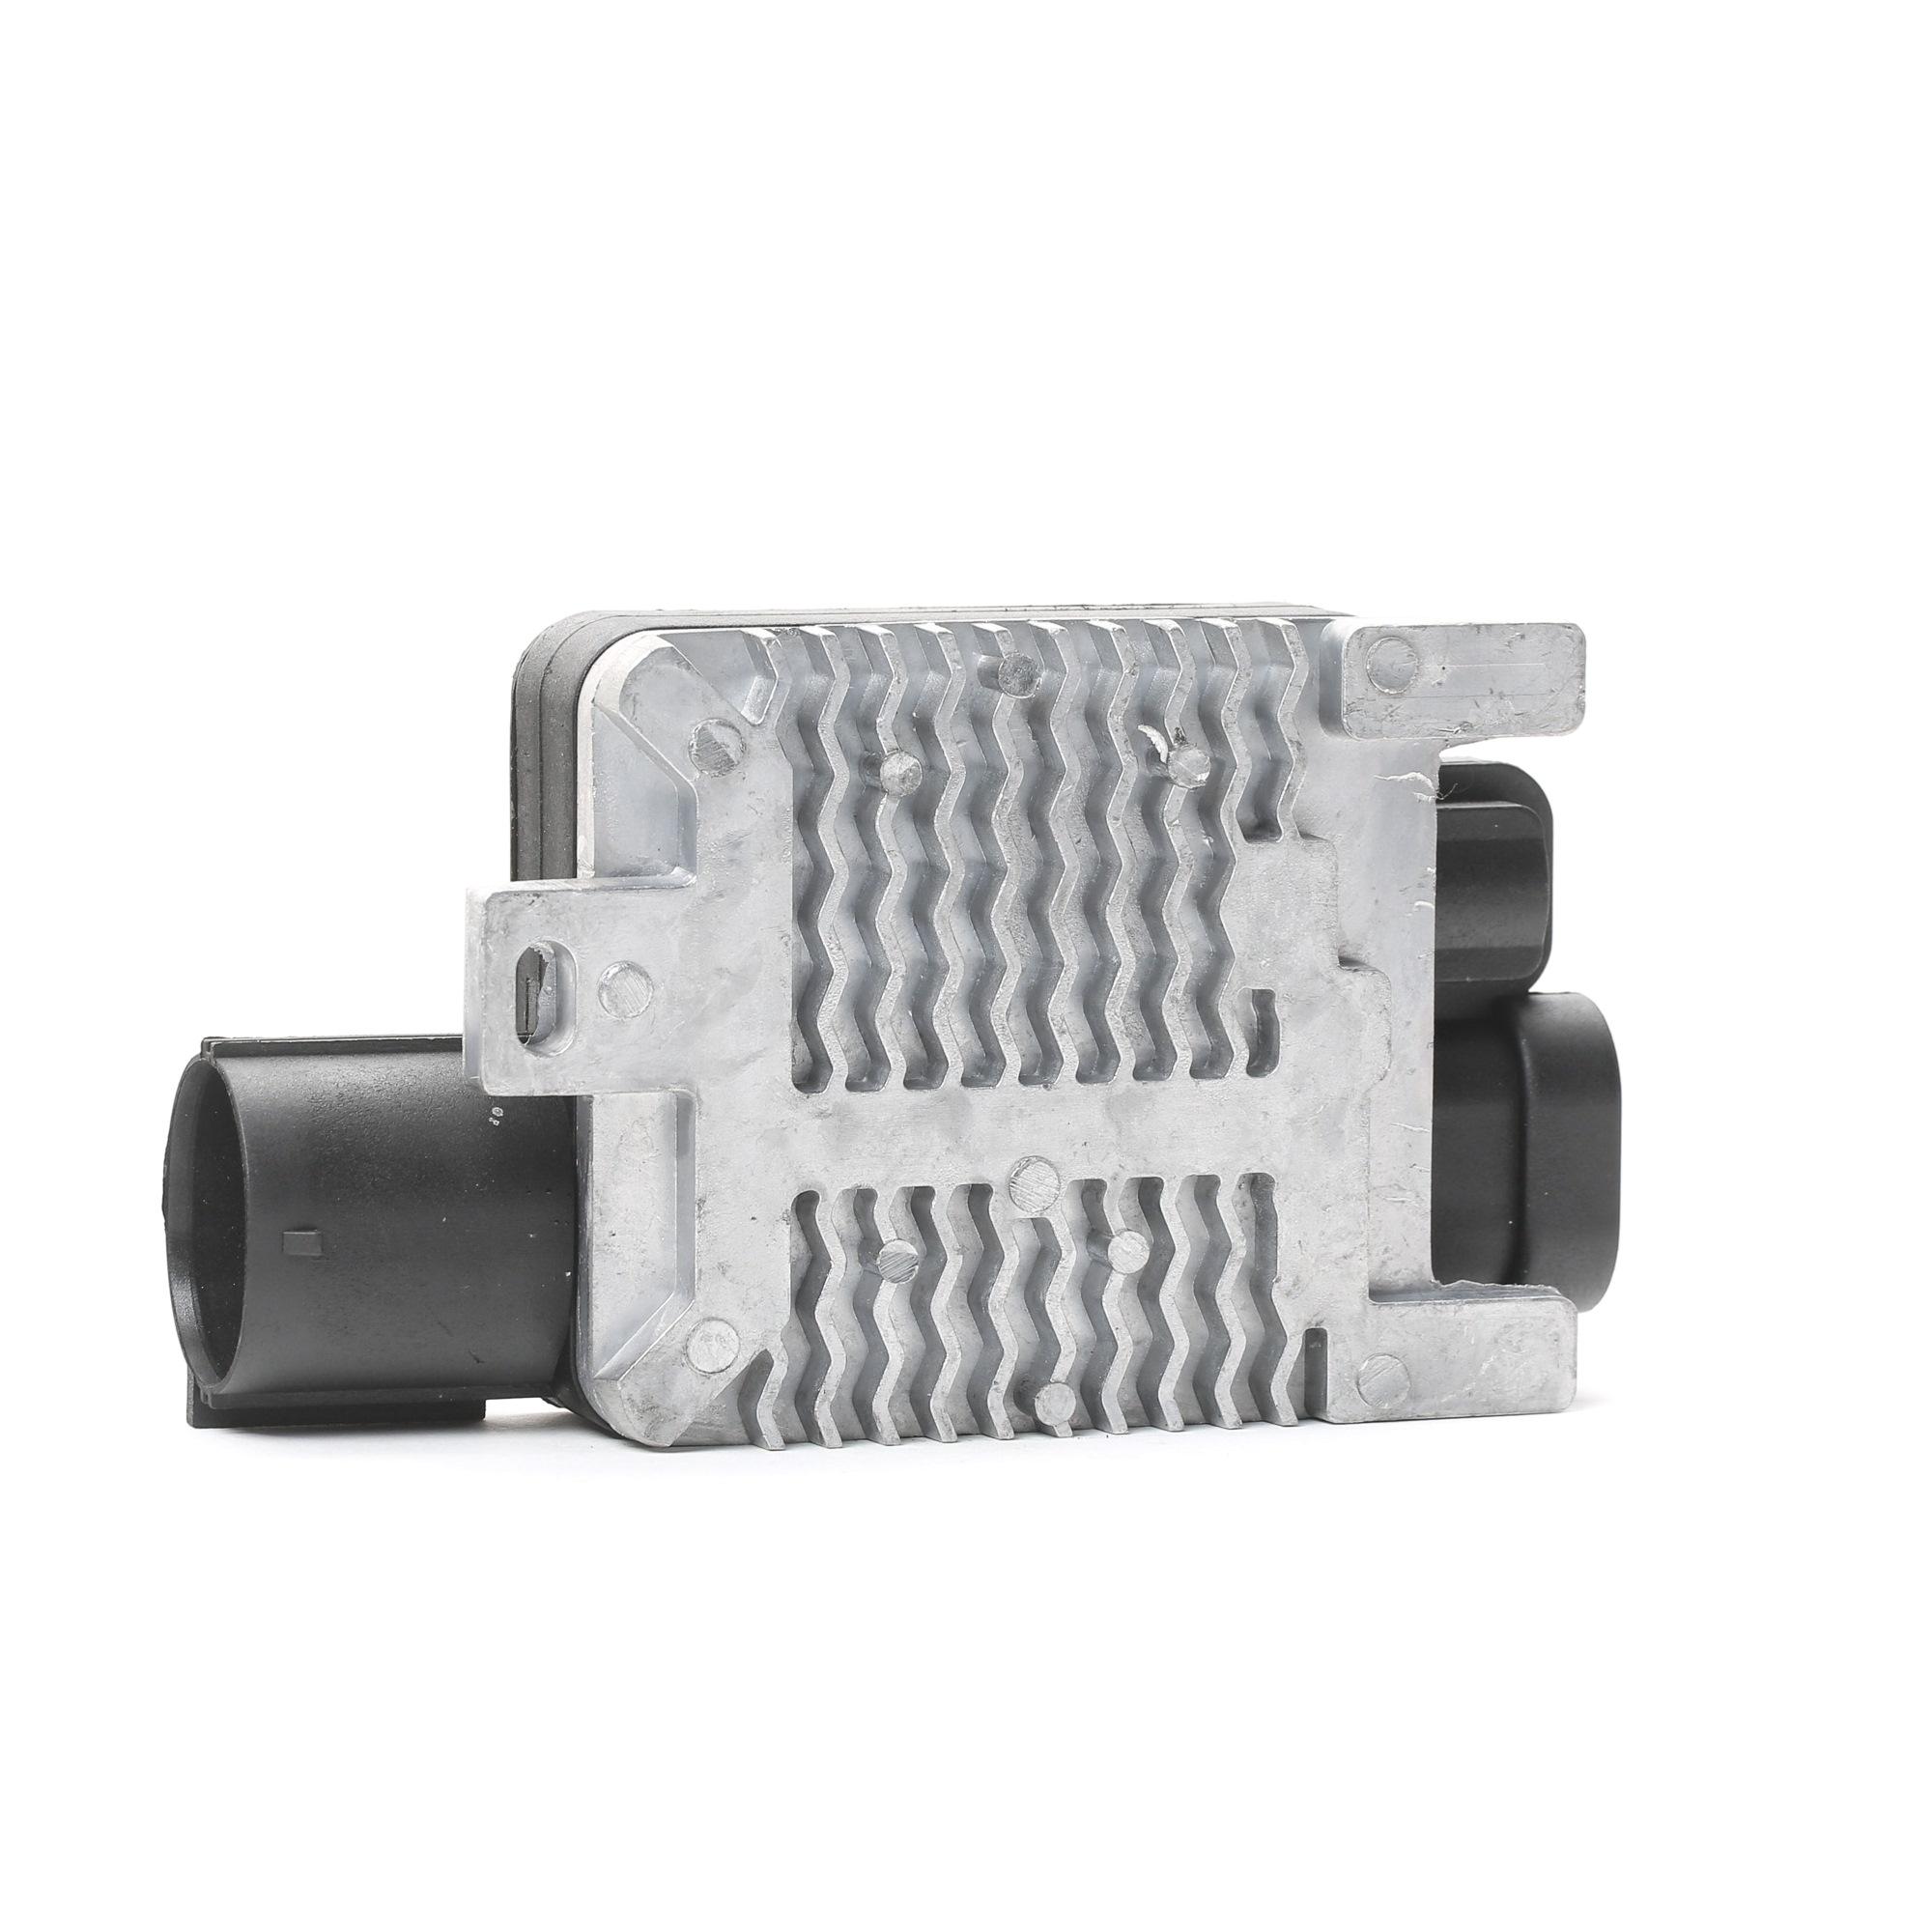 V25-79-0009 VEMO Εγκέφαλος, ηλεκτρικό βεντιλατέρ (ψύξη κινητήρα) - αγοράστε ηλεκτονικά